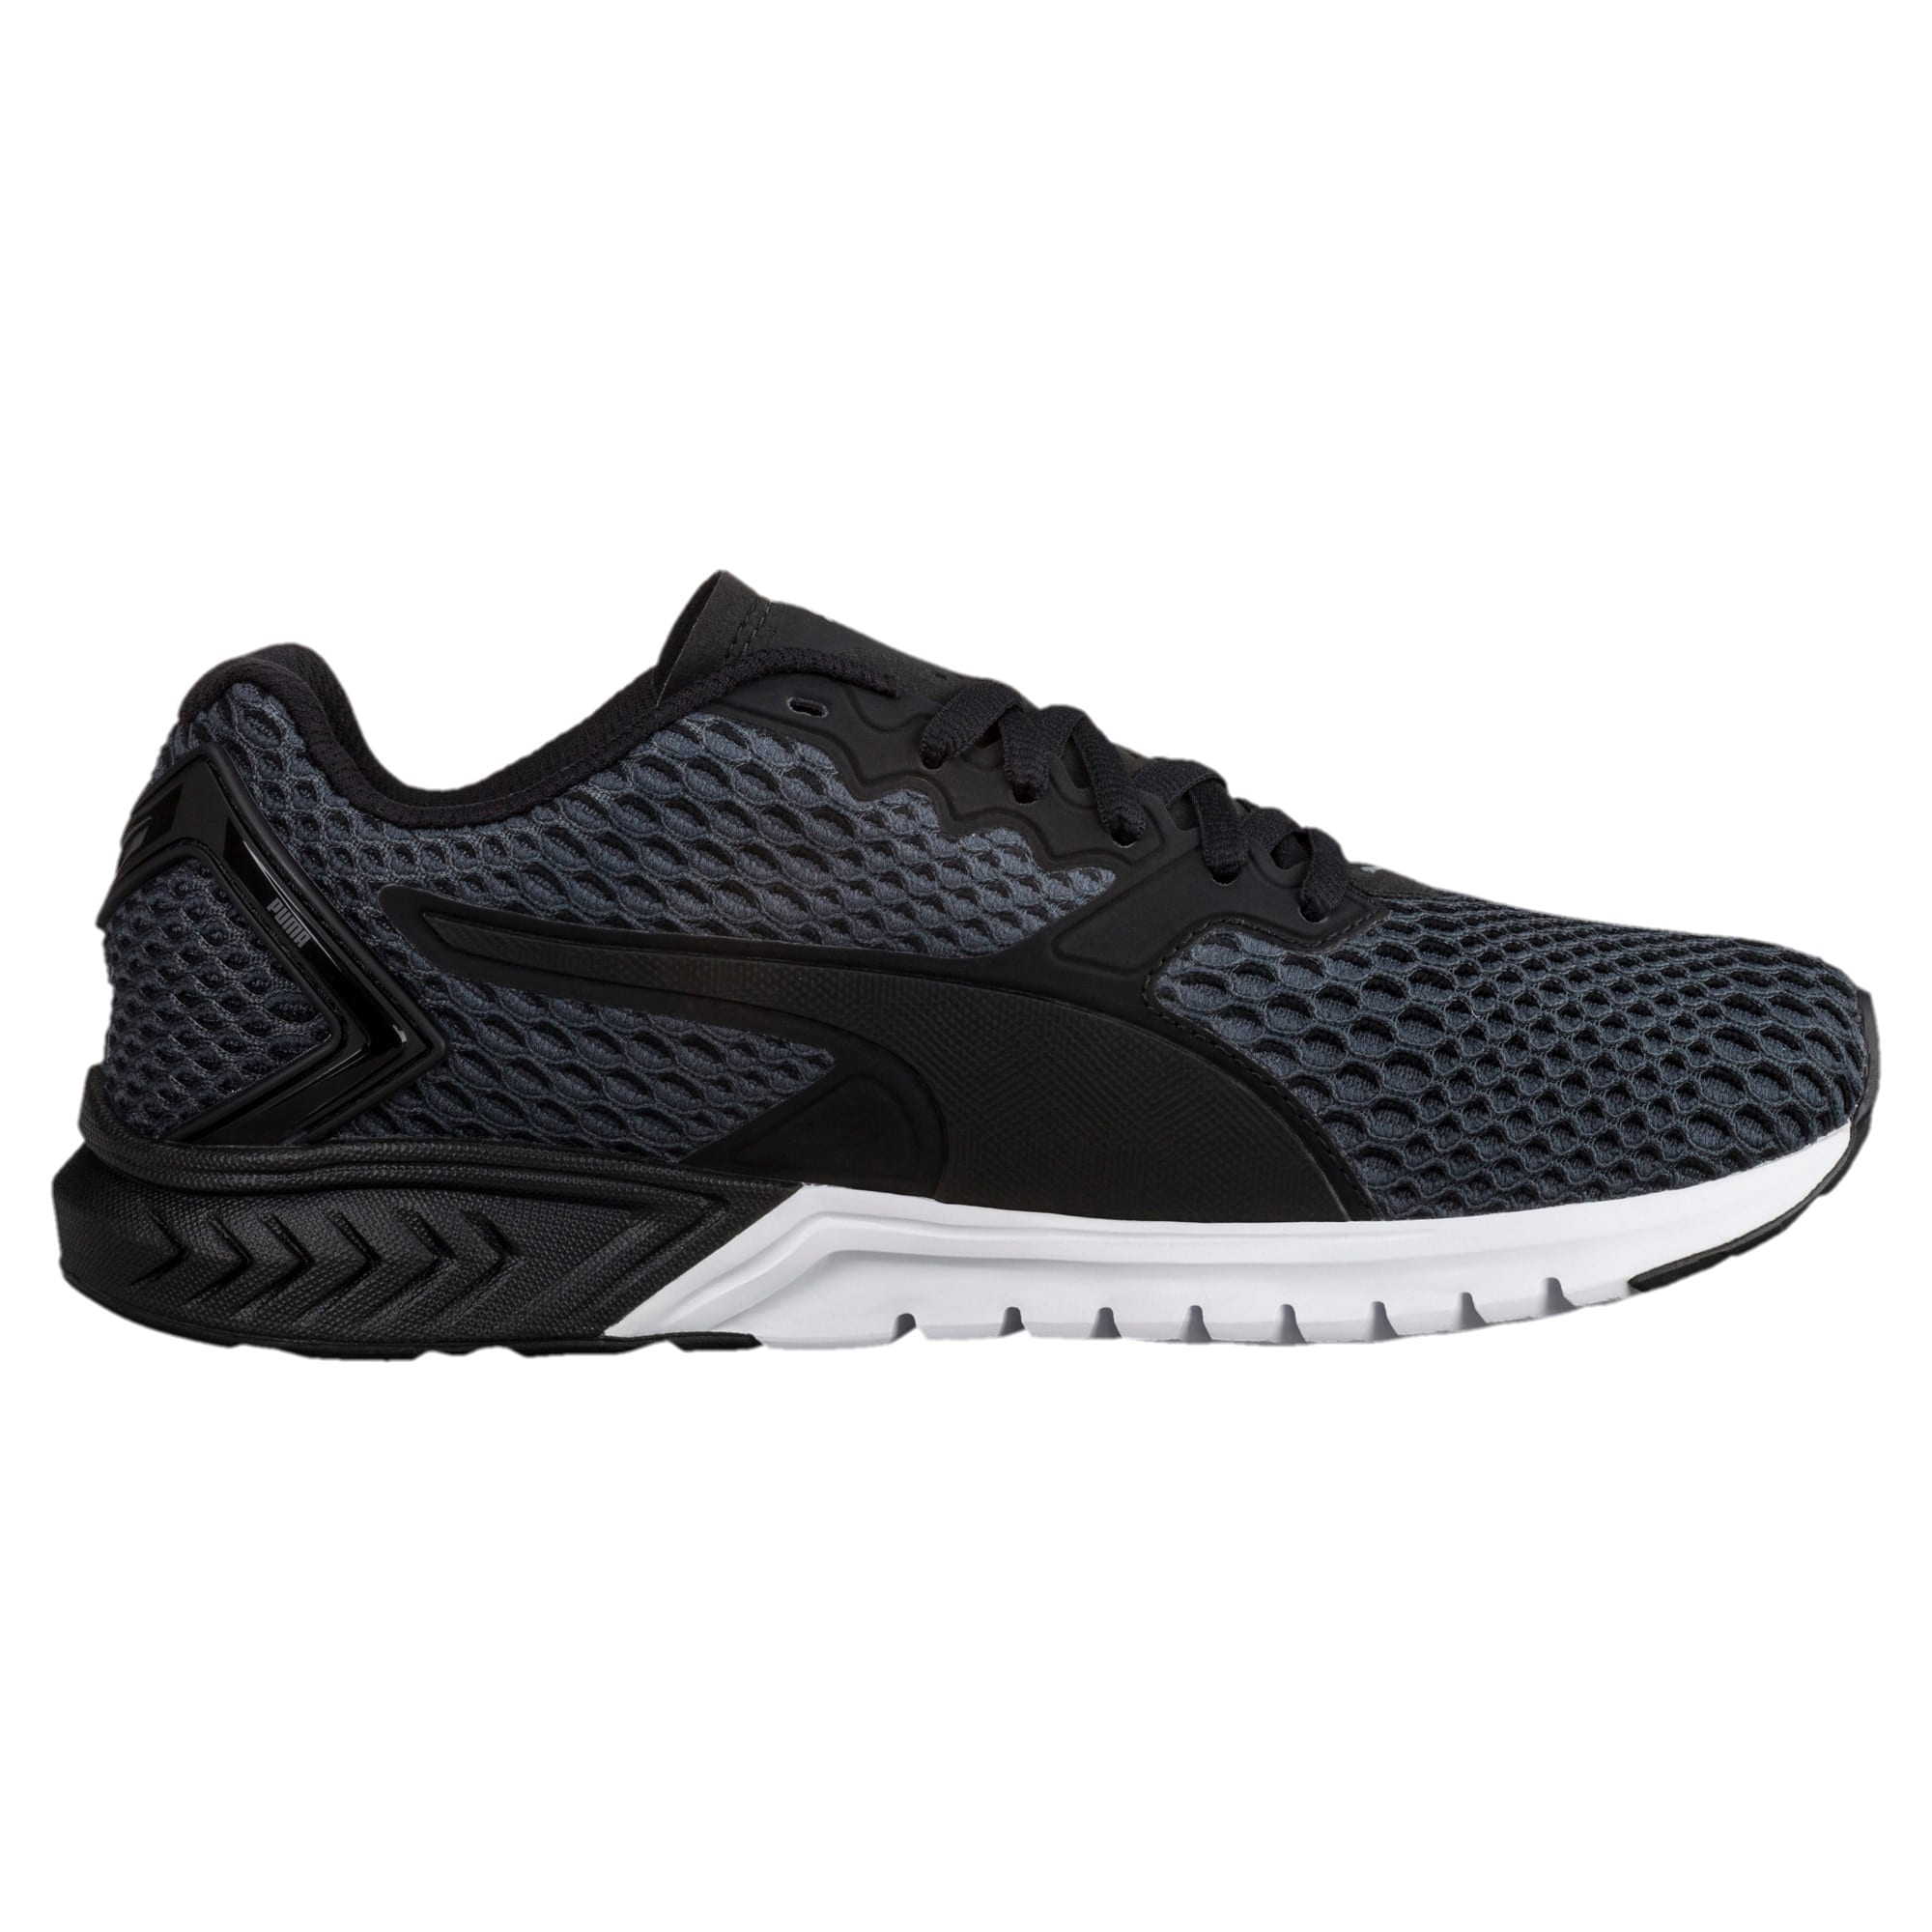 Thumbnail 3 of IGNITE Dual New Core Women's Training Shoes, Puma Black-Asphalt, medium-IND